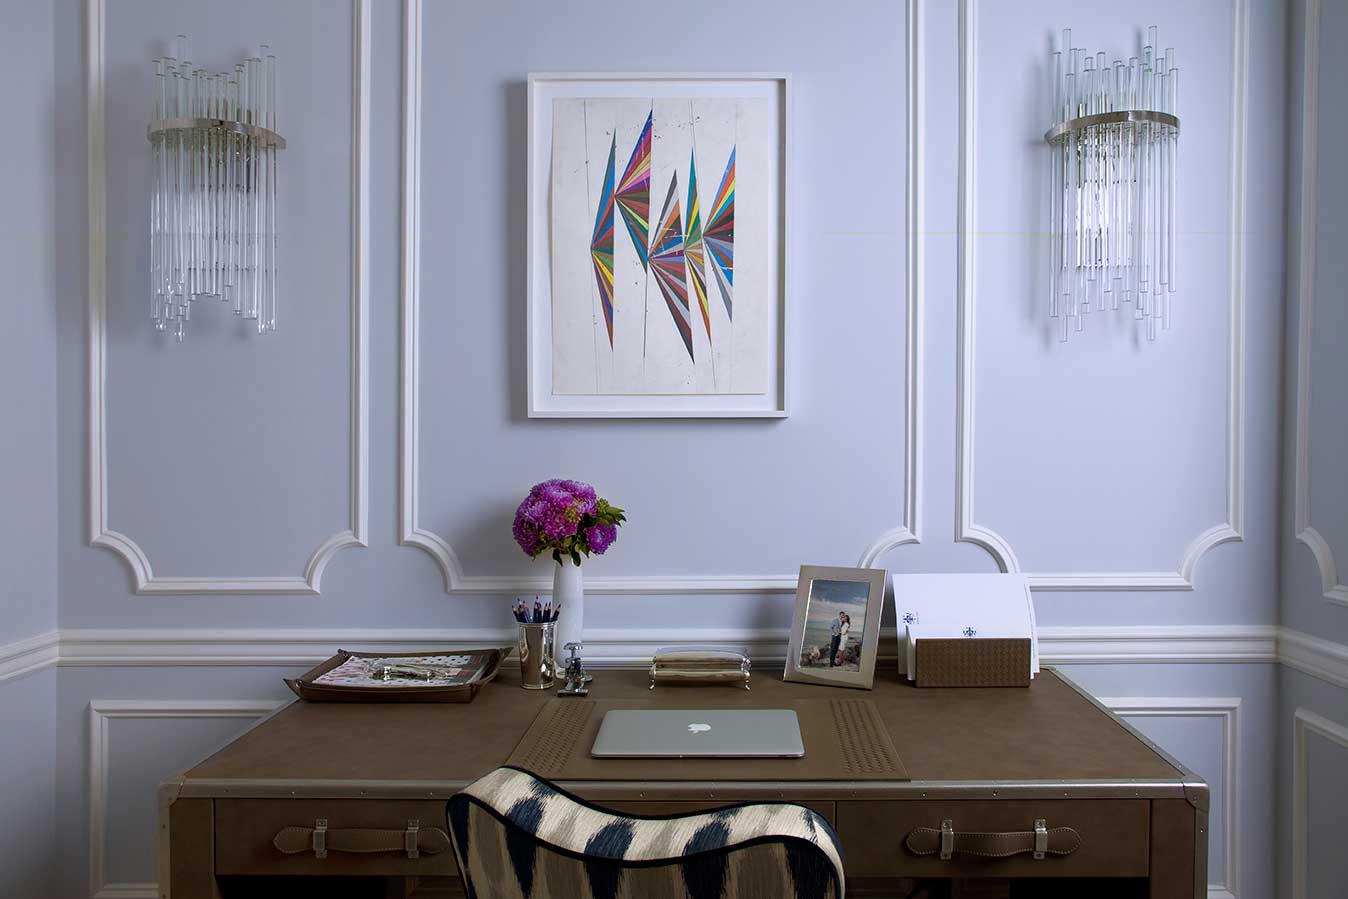 Nicole-Fuller-Florence-Fancy-childrens-boutique-new-york-interior-designer-1